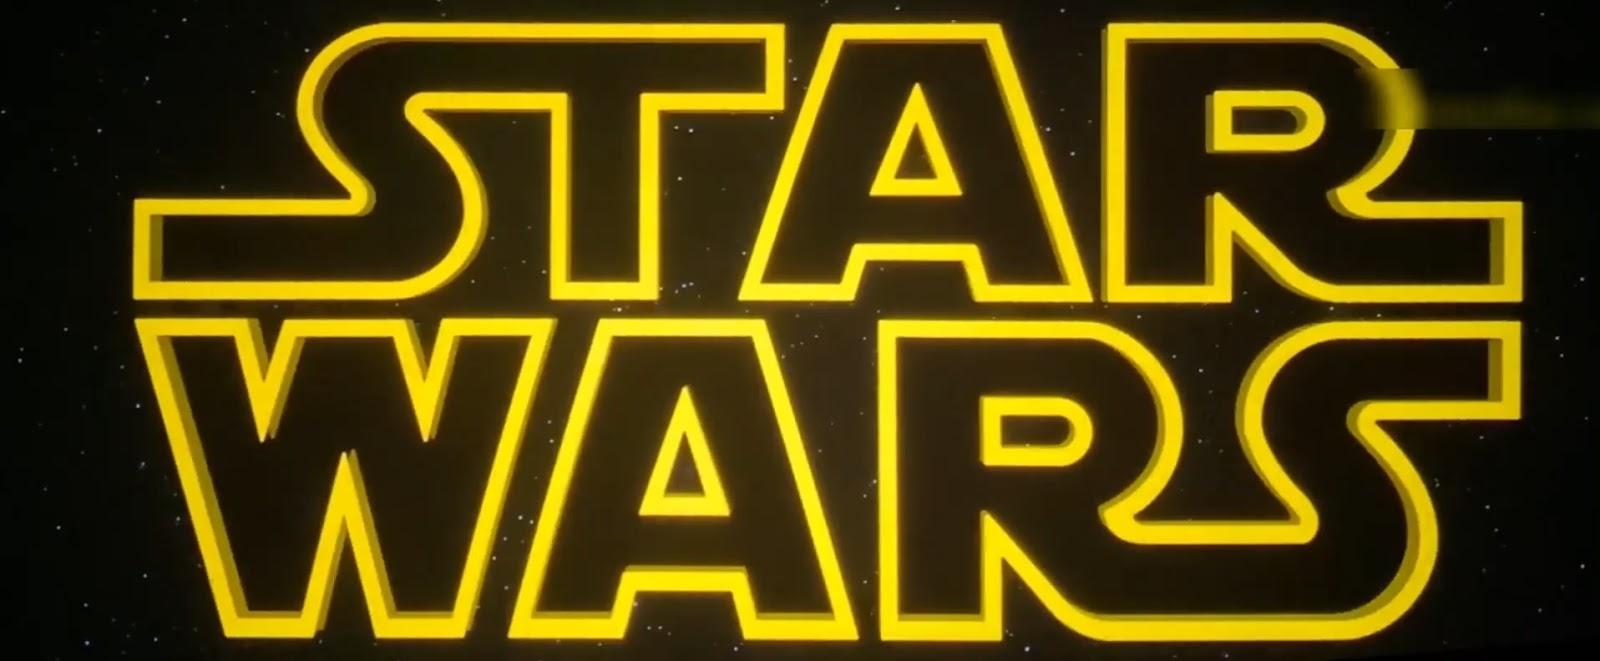 Star+Wars+El+ascenso+de+Skywalker+%282019%29+HDTS+1080p+Latino+-+Ingles.mkv_snapshot_00.00.20.833.jpg (1600×661)